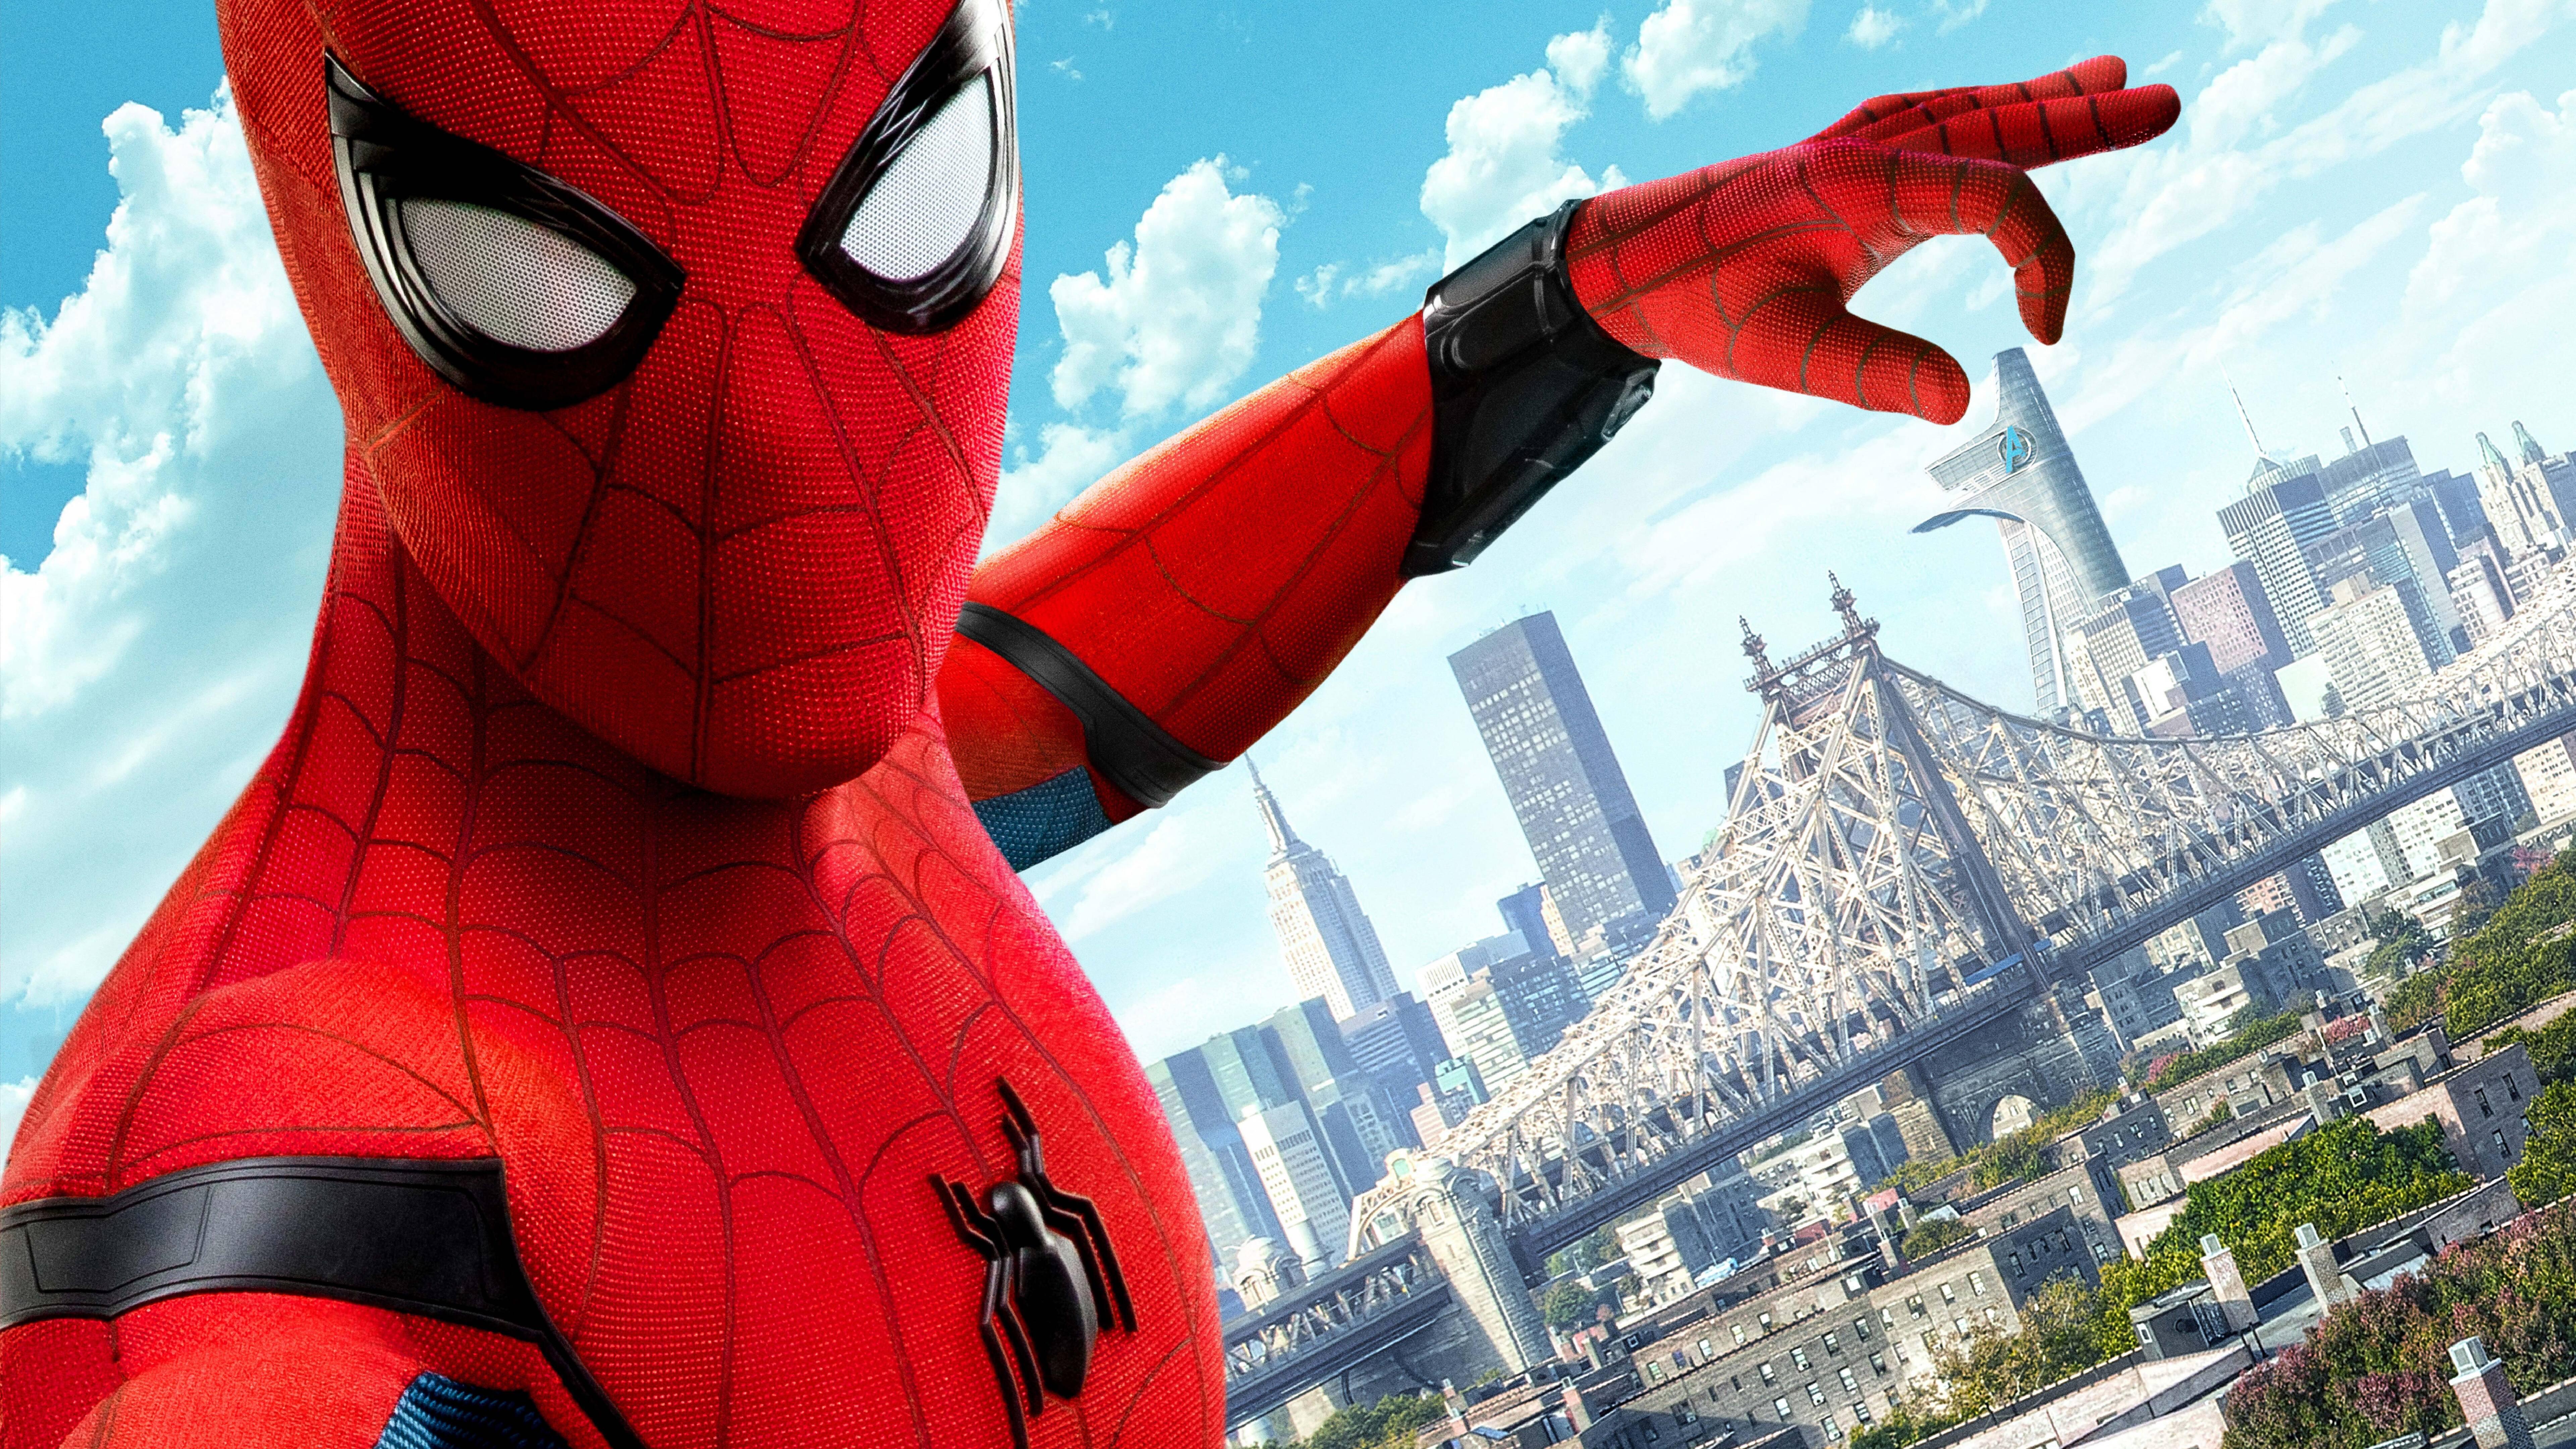 7680x4320 Spiderman Homecoming 2017 8k 8k Hd 4k Wallpapers